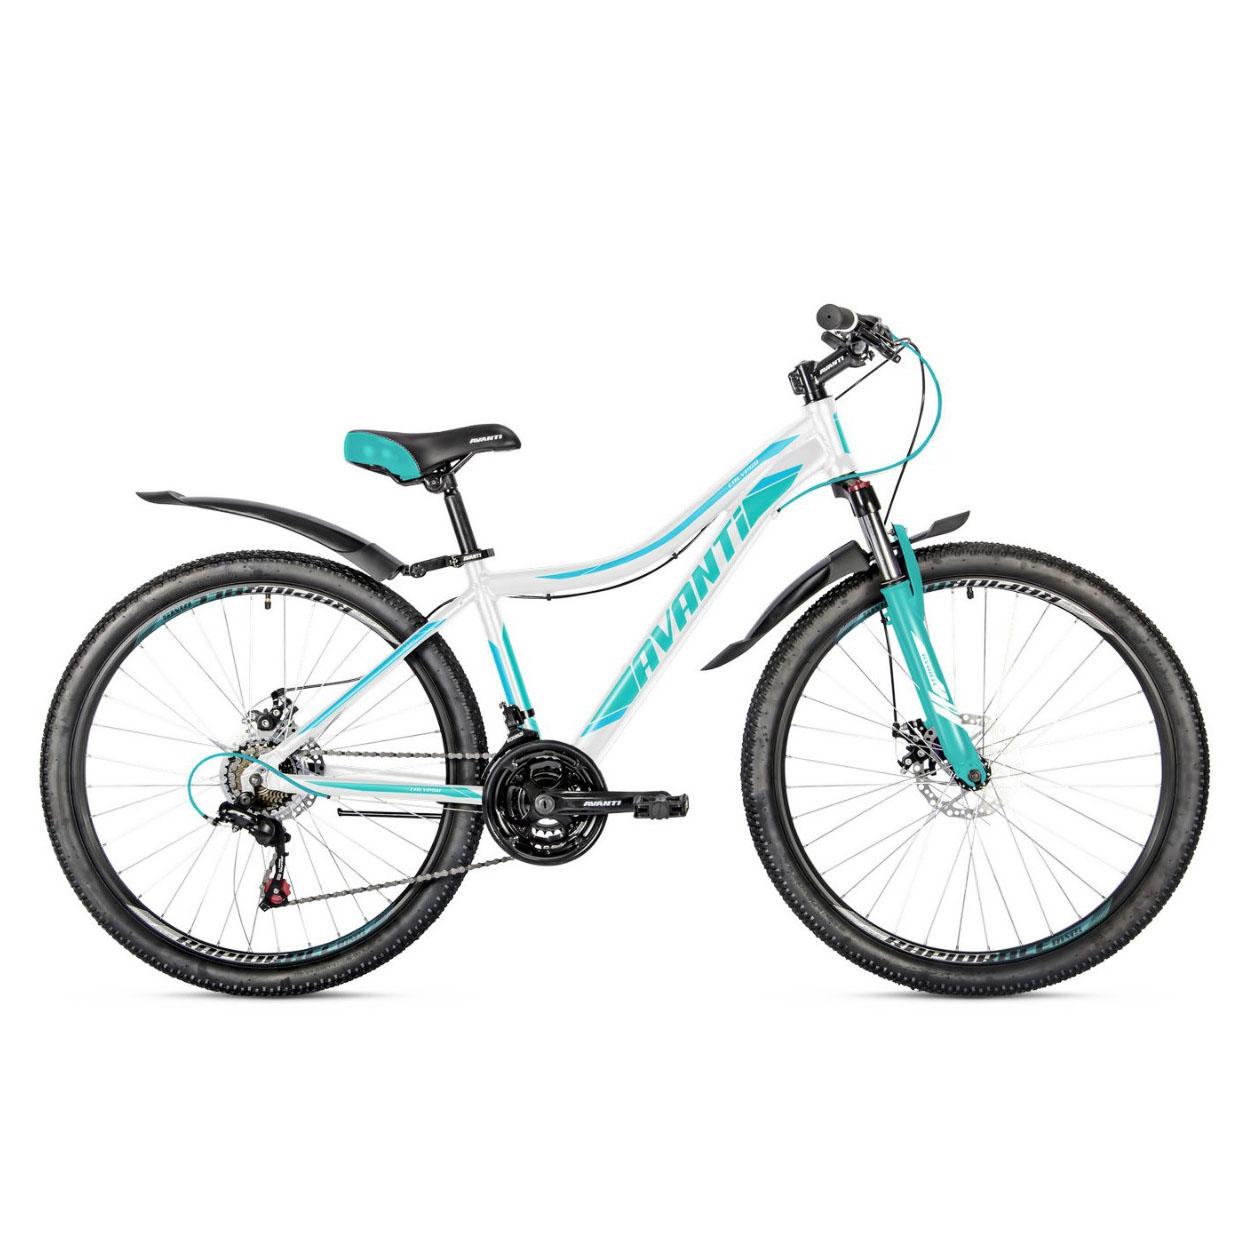 Фото Женский Велосипед  26 Avanti Calypso disk 2018 вилка Lock Out  бело-бирюзовый